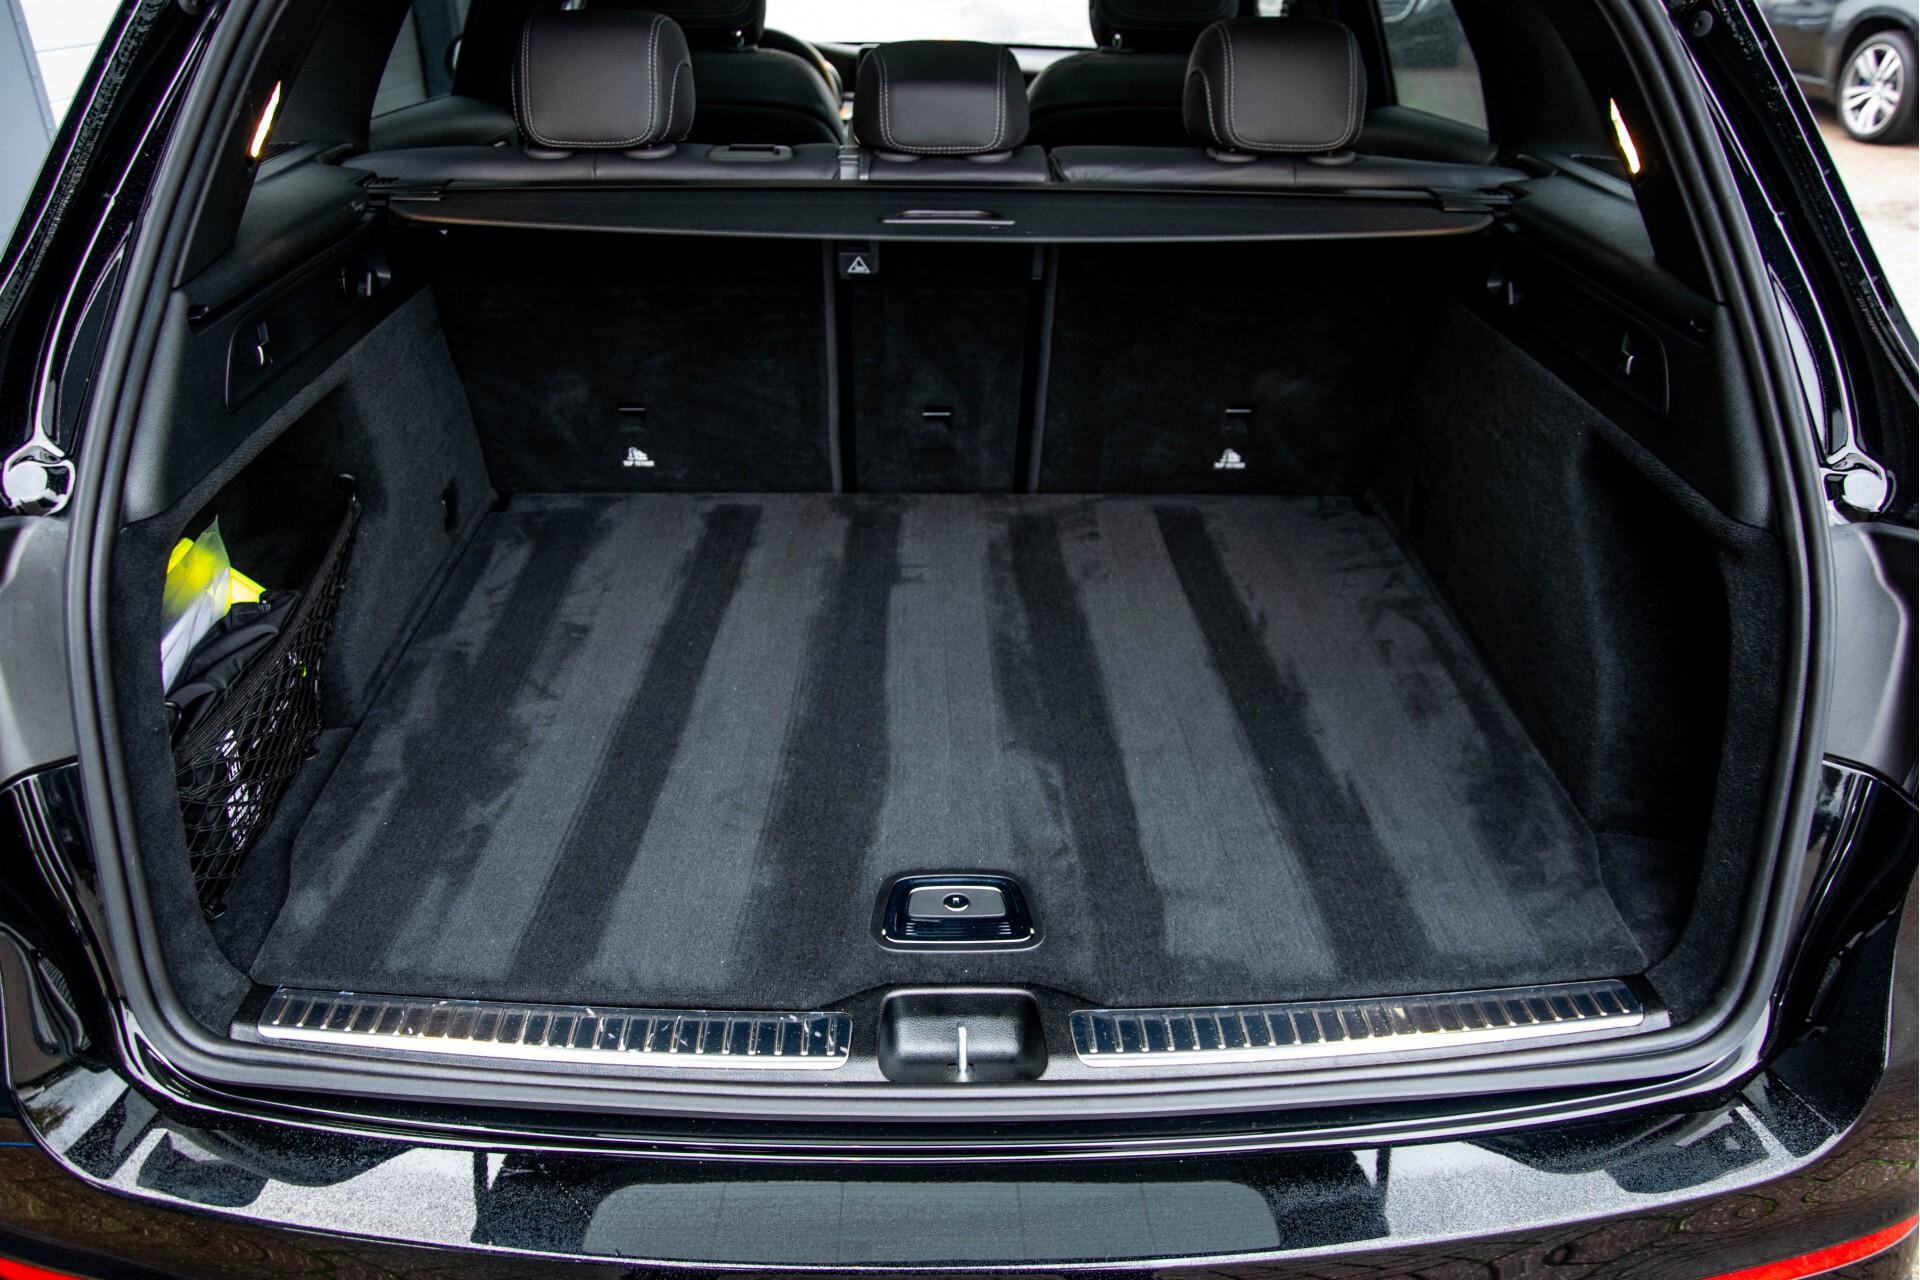 Mercedes-Benz GLC 200 4-M AMG Night/Panorama/Distronic Pro/Burmester/360camera/Exclusive Aut9 Foto 57